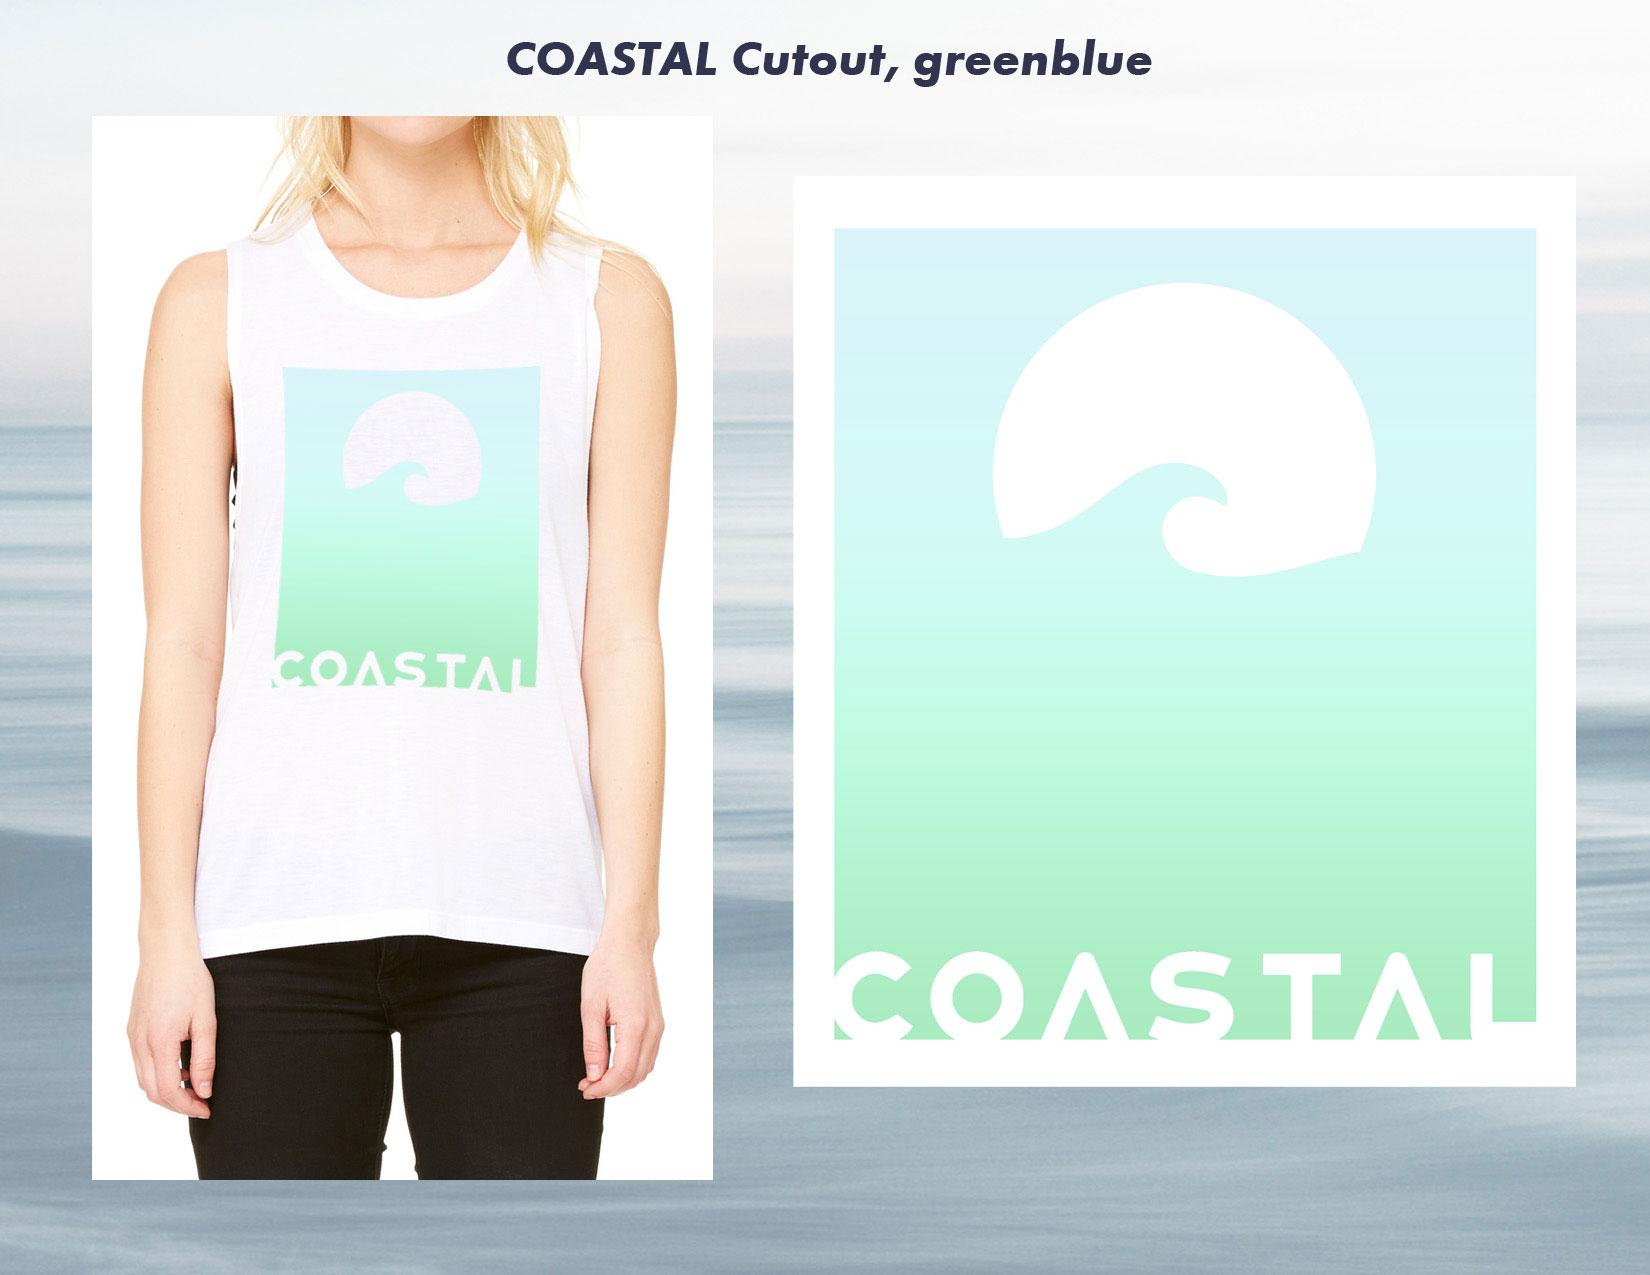 Coastal-Cutout-greenblue-mock